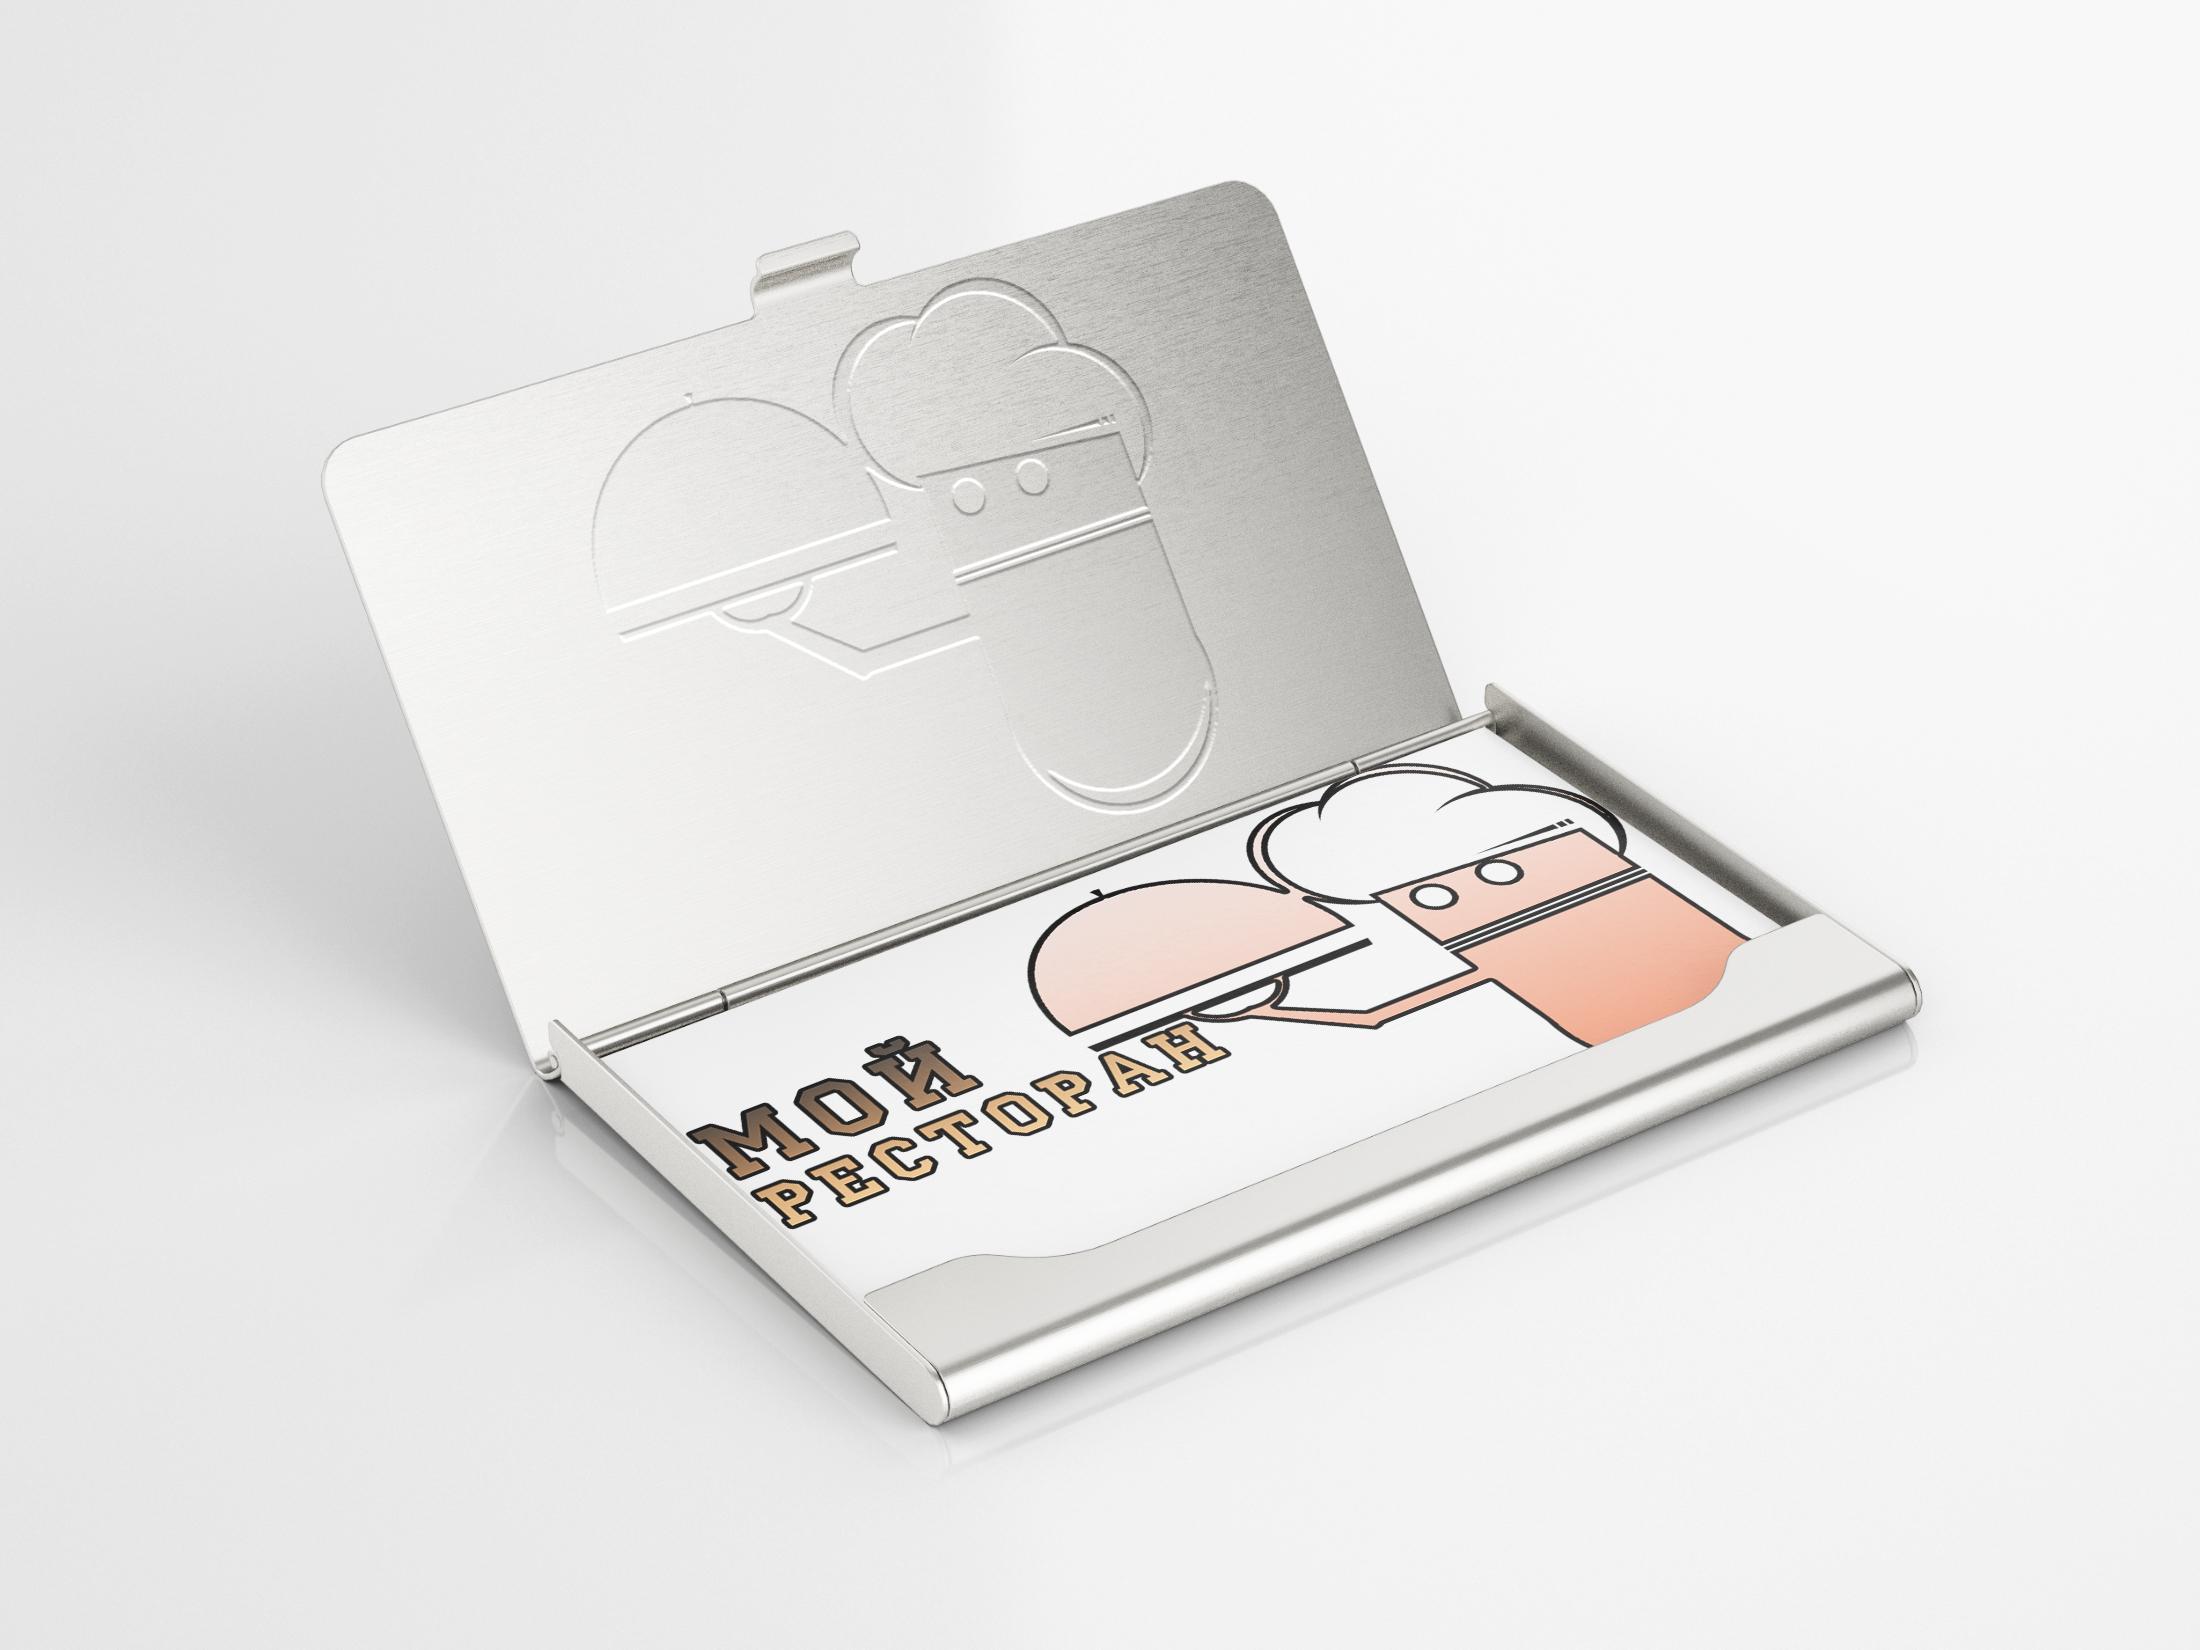 Разработать логотип и фавикон для IT- компании фото f_5025d54323430749.jpg